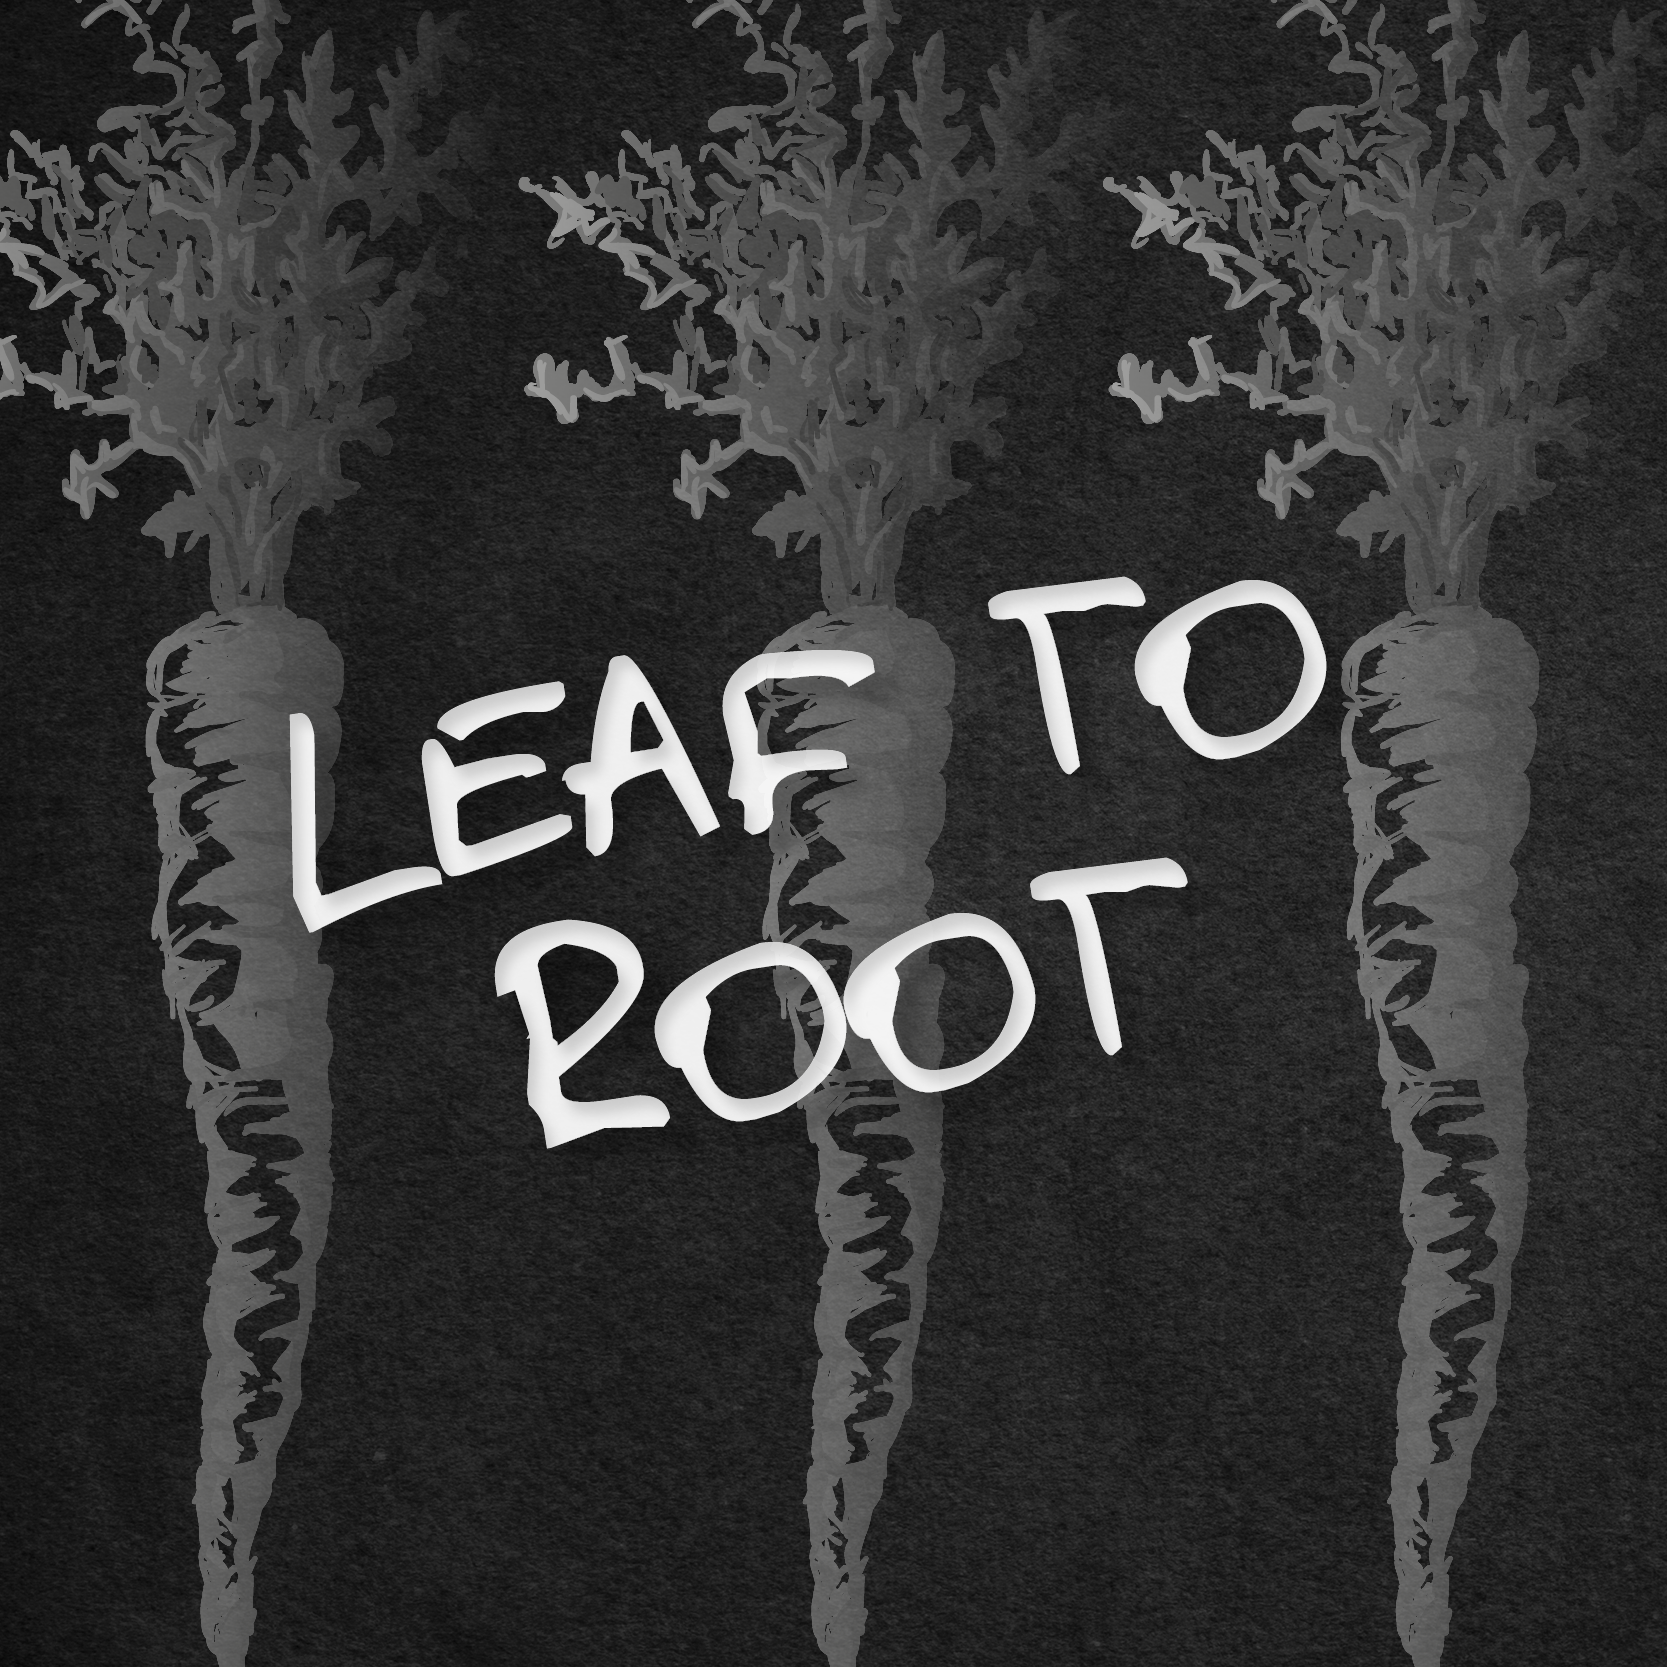 LEAF TO ROOT 14. & 15. OKTOBER